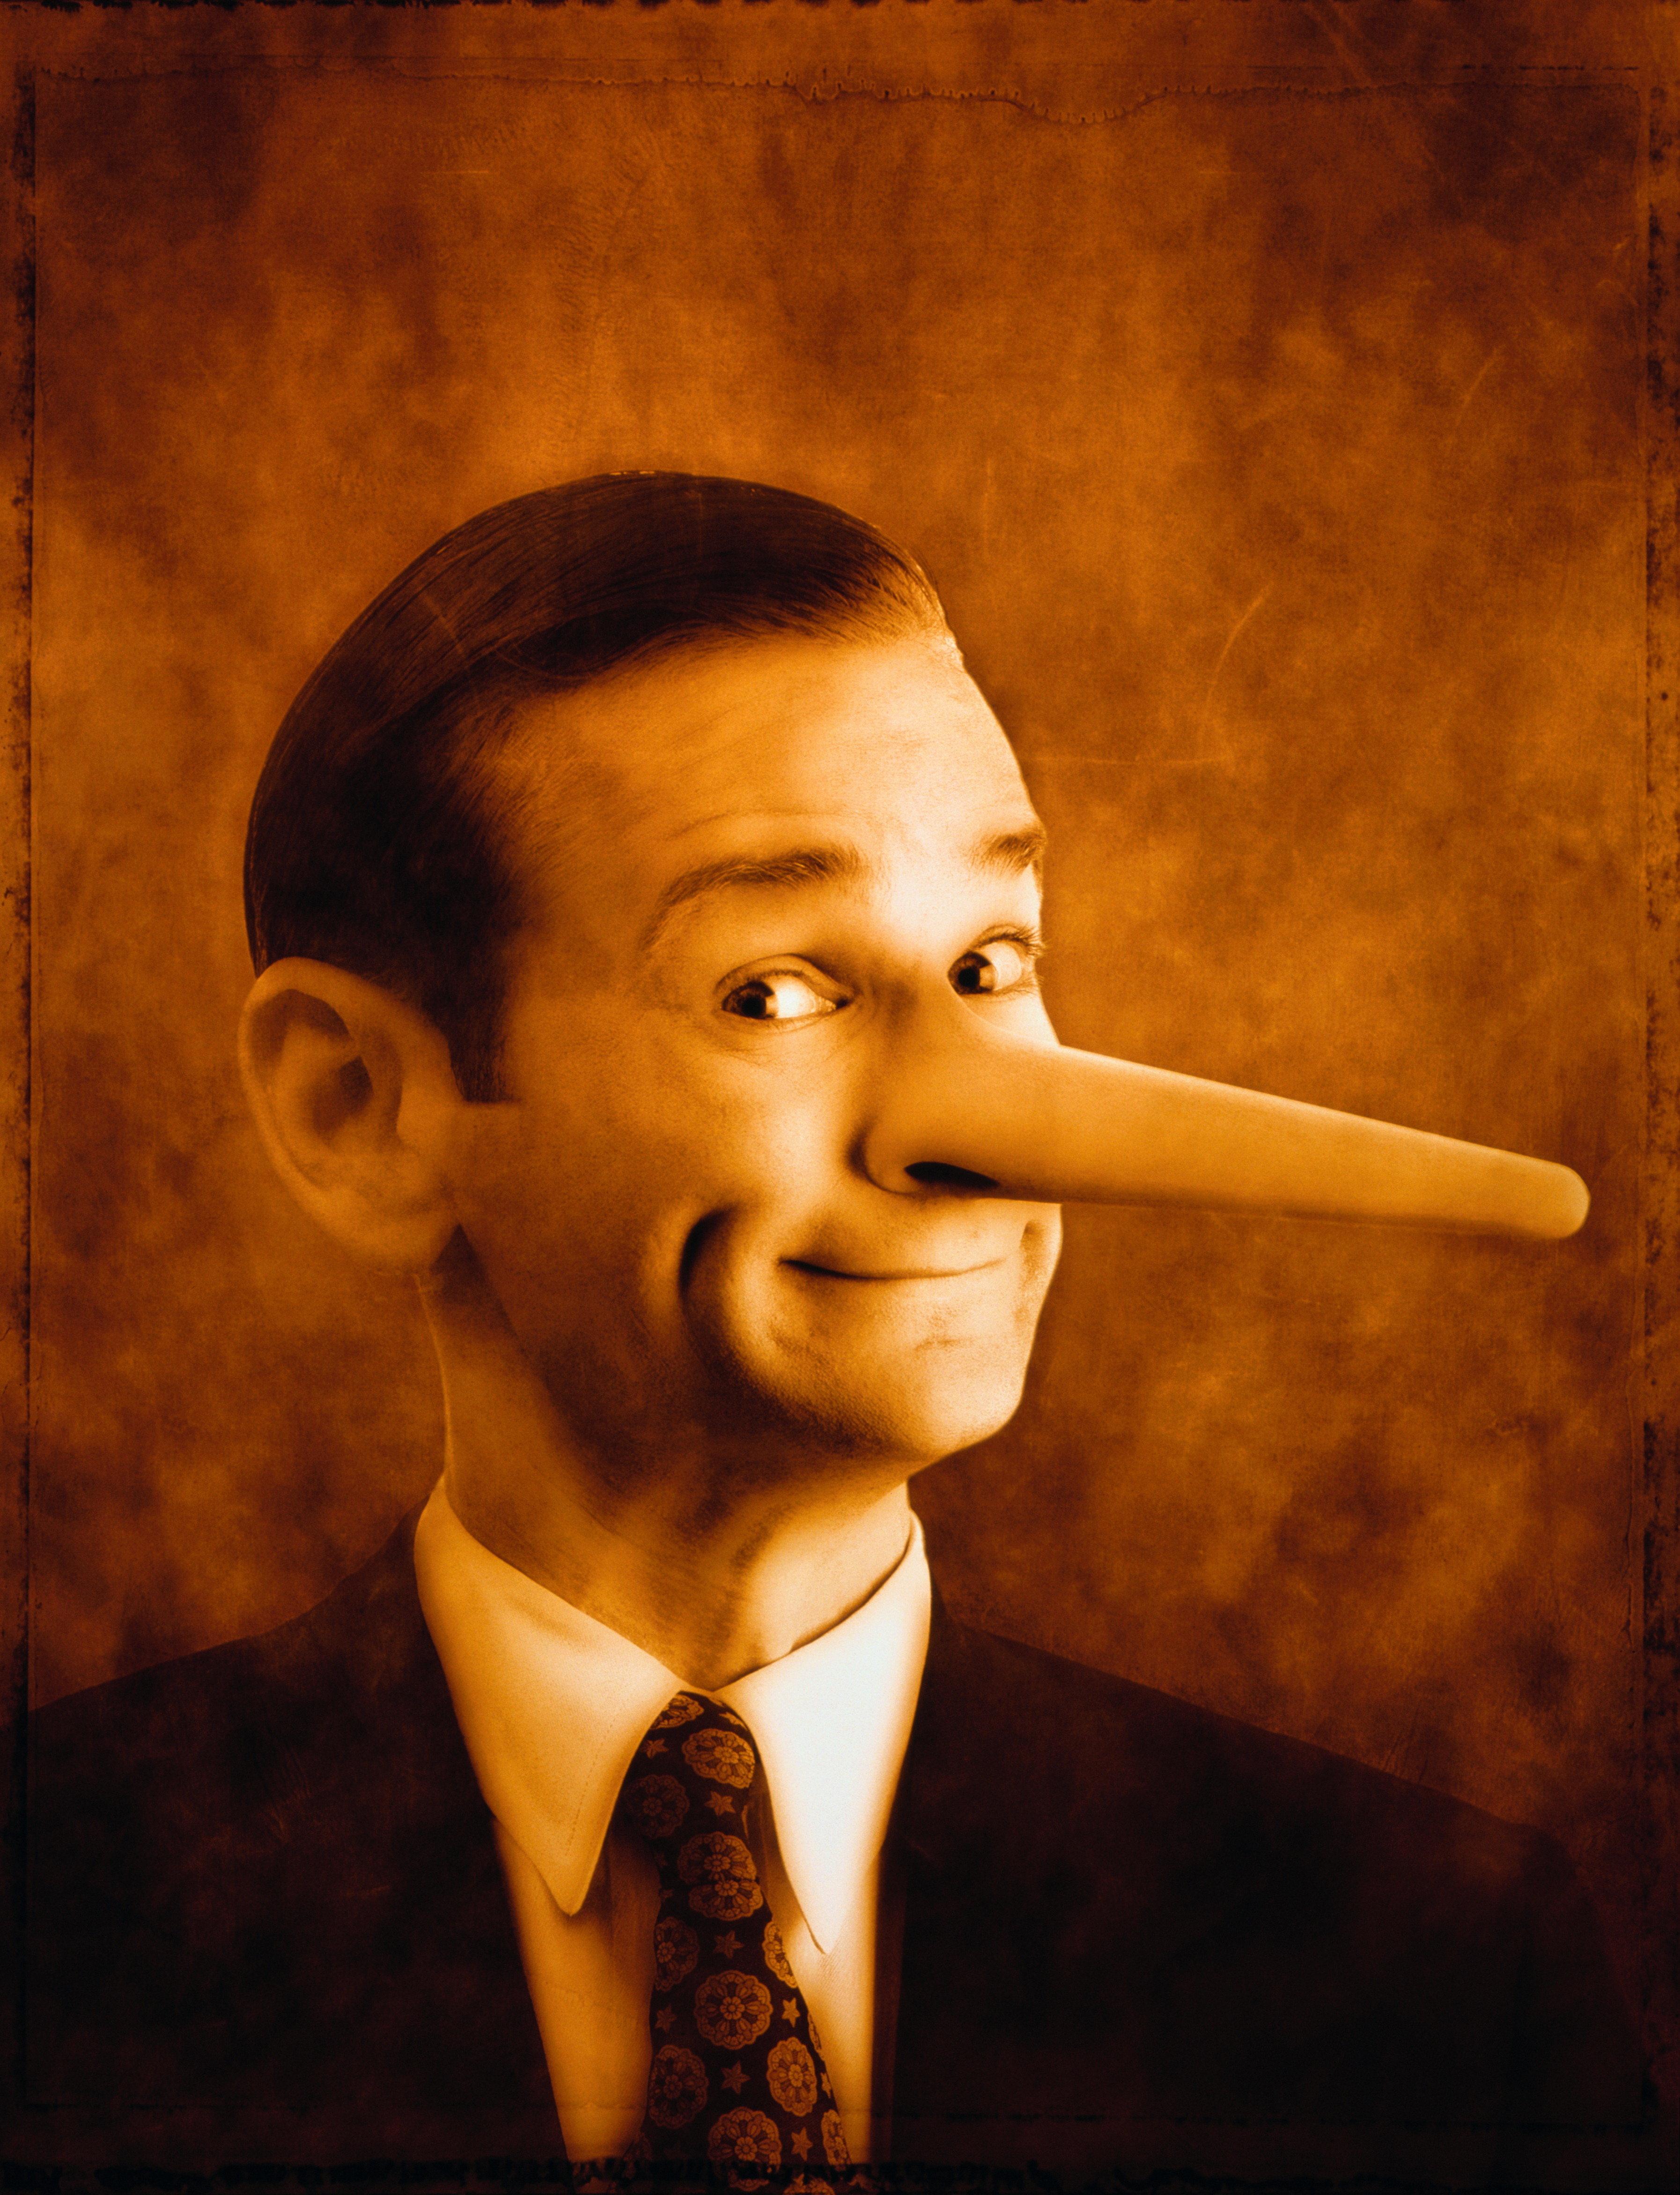 Businessman with long 'Pinnochio' nose (Digital Enhancement)